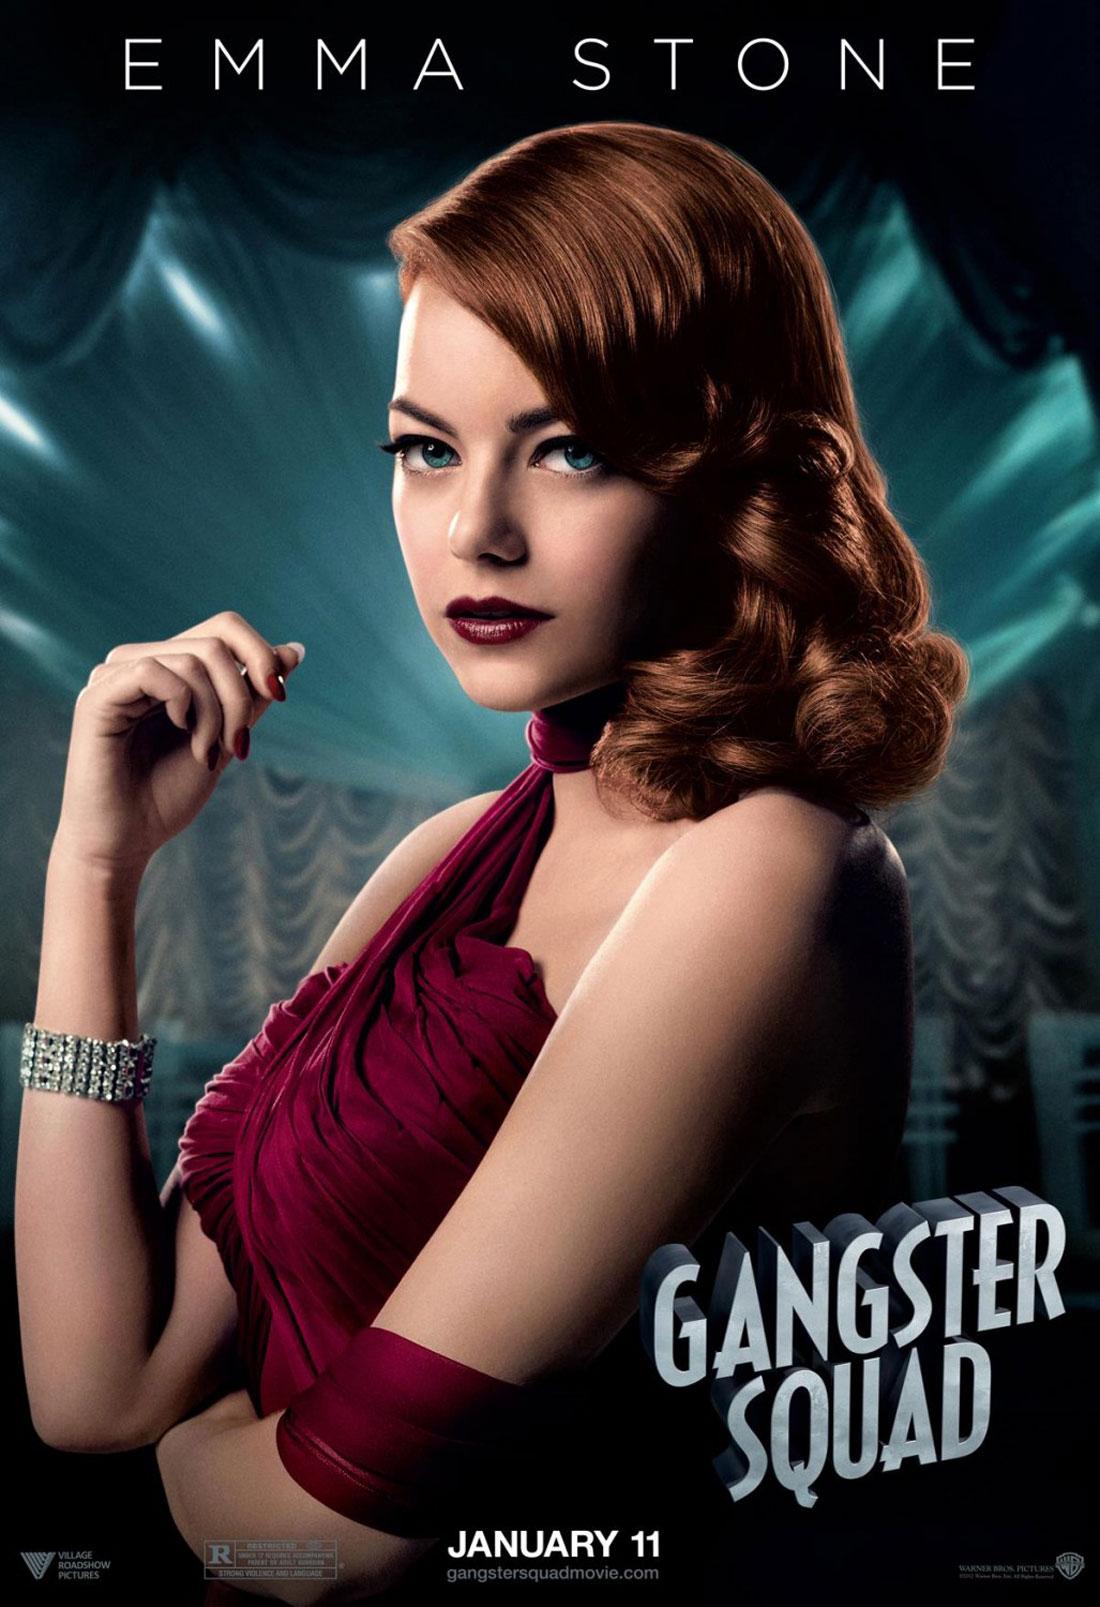 Gangster Squad - Movie Poster #3 (Original)